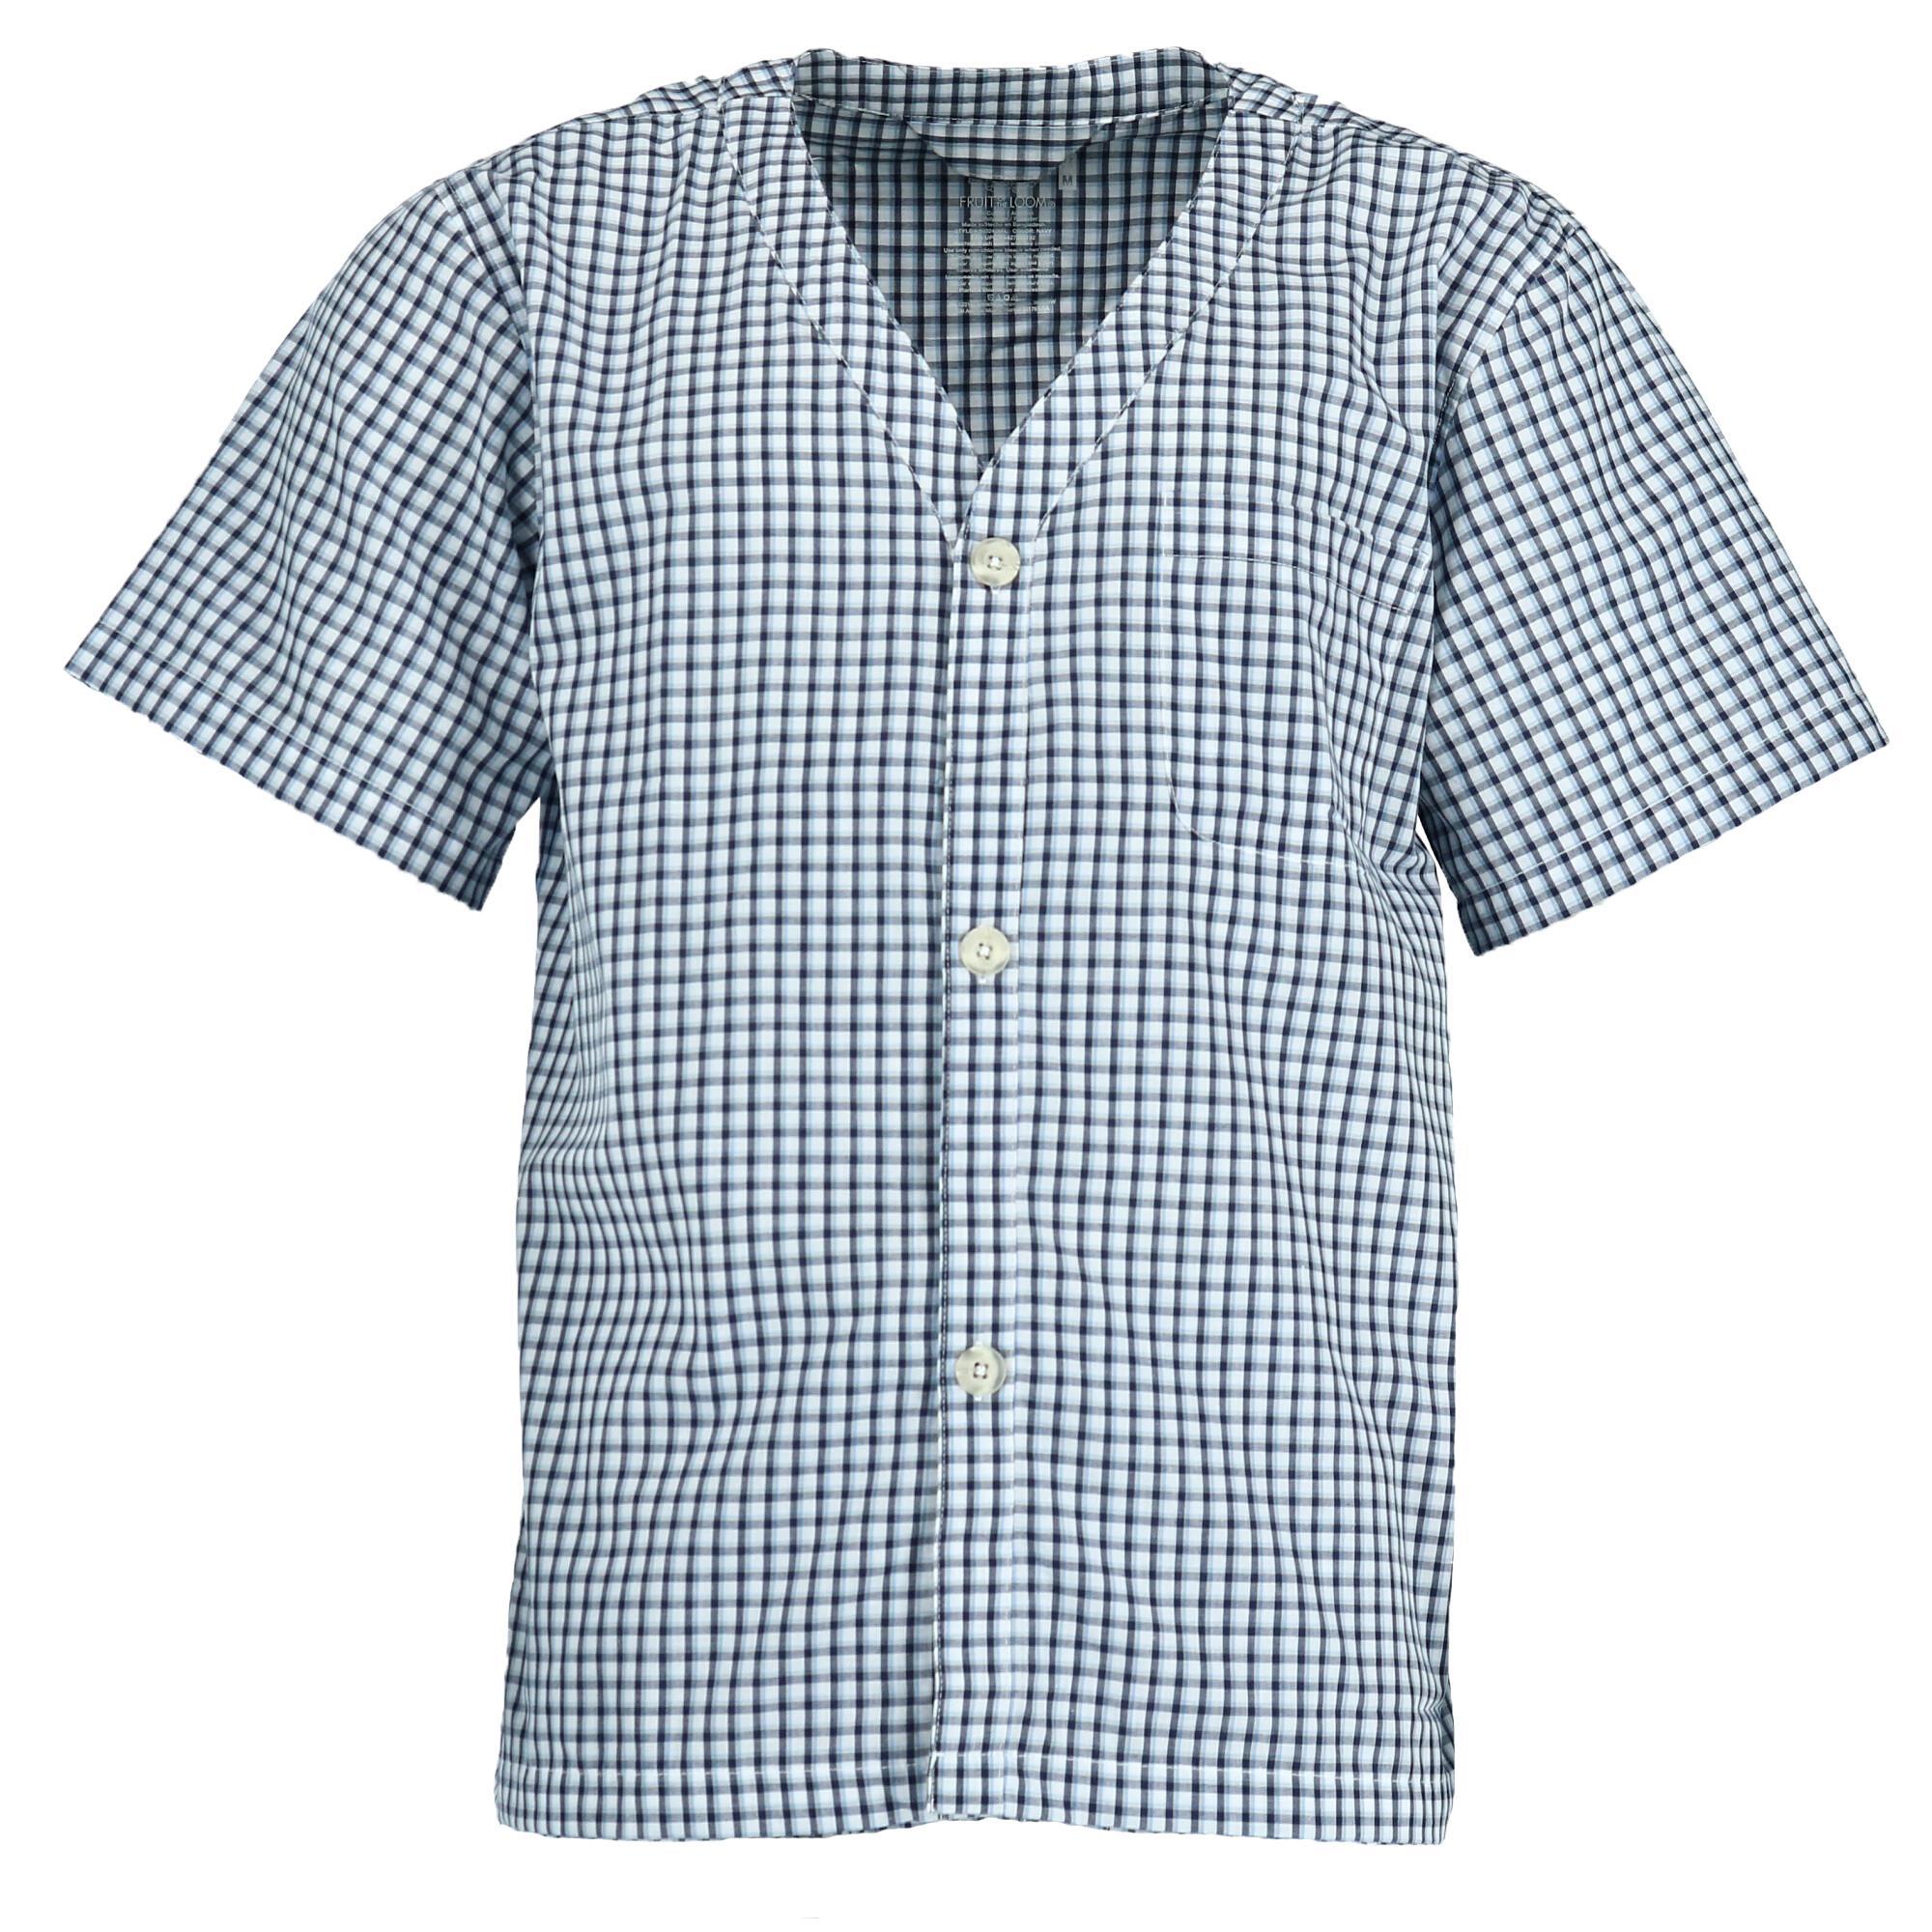 New Fruit of the Loom Men/'s Short Sleeve Long Leg Pajamas Royal Blue Stripe